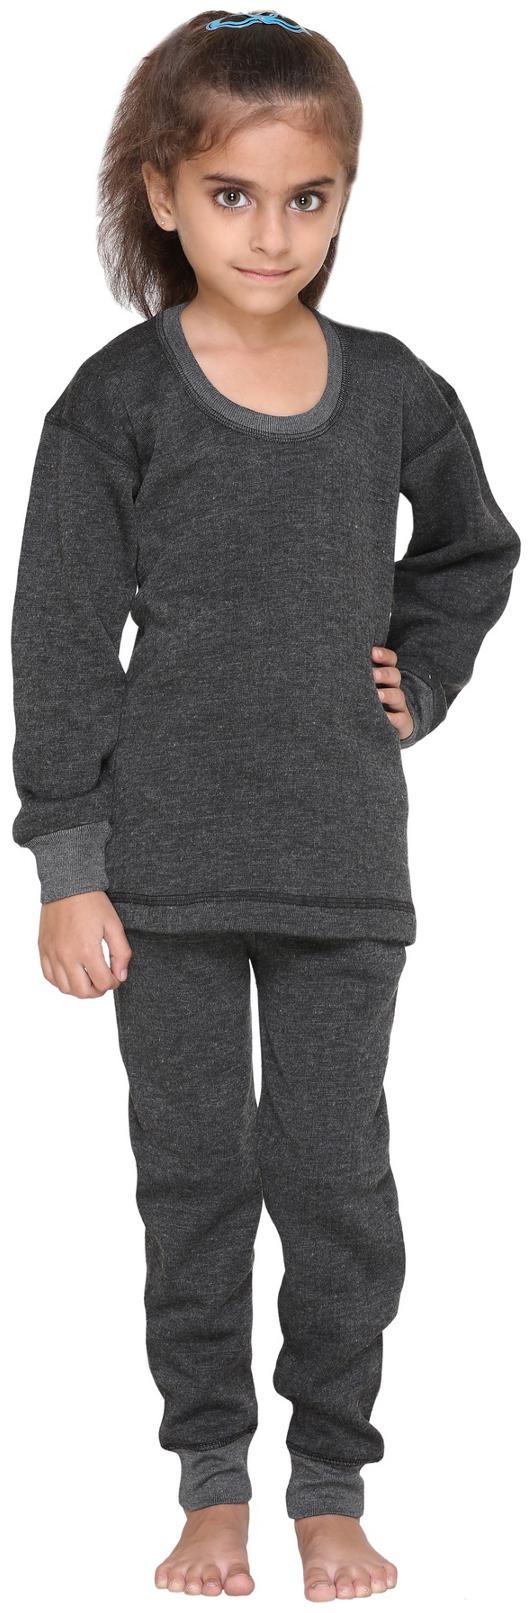 Vimal Jonney Winter Cover Blended Thermal Top   Pyjama Set For Girls by Mack Hosiery